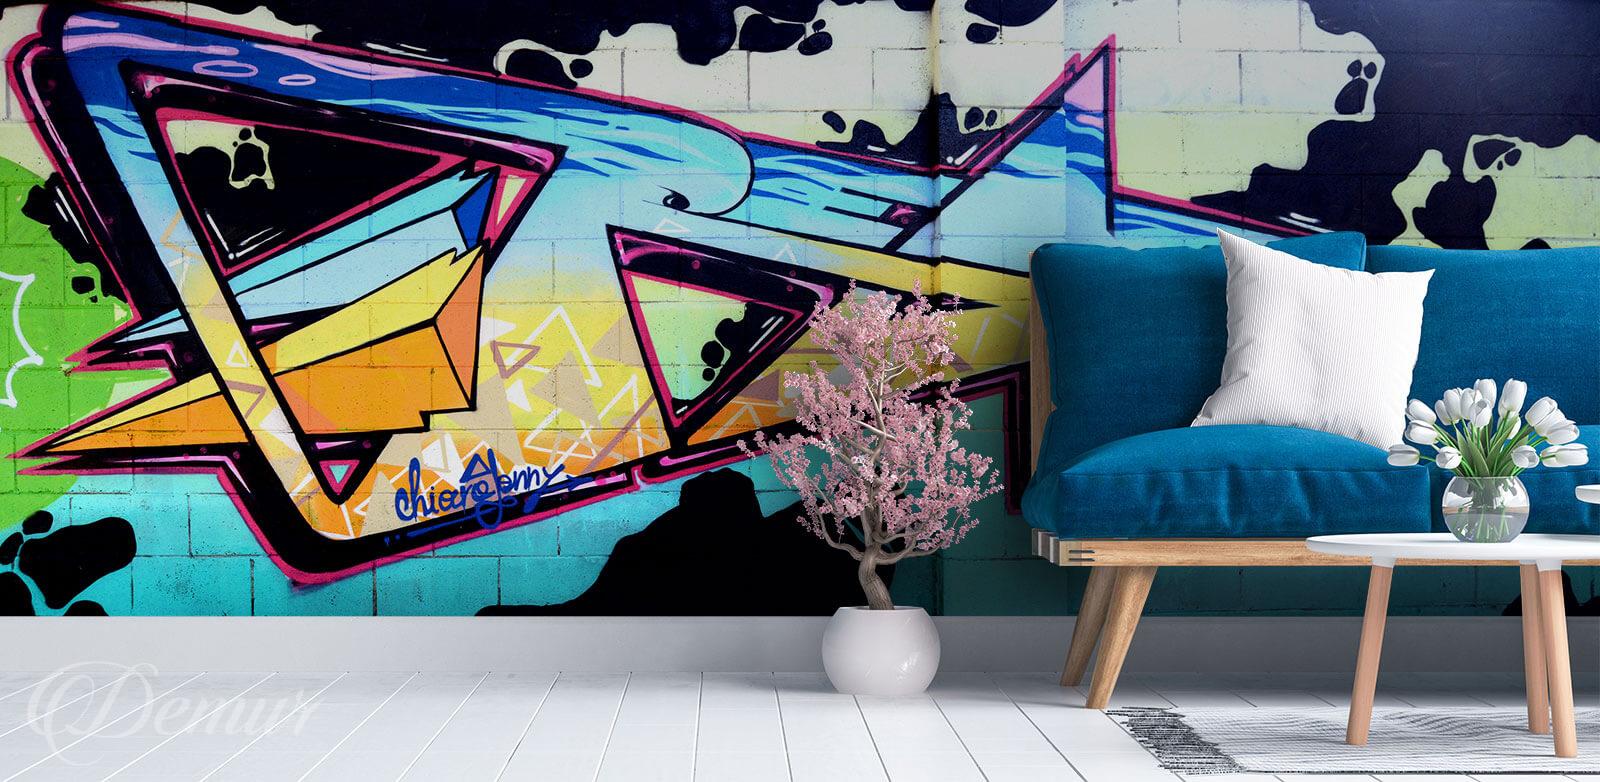 Fototapeta Styl w sprayu - Fototapeta graffiti - Demur